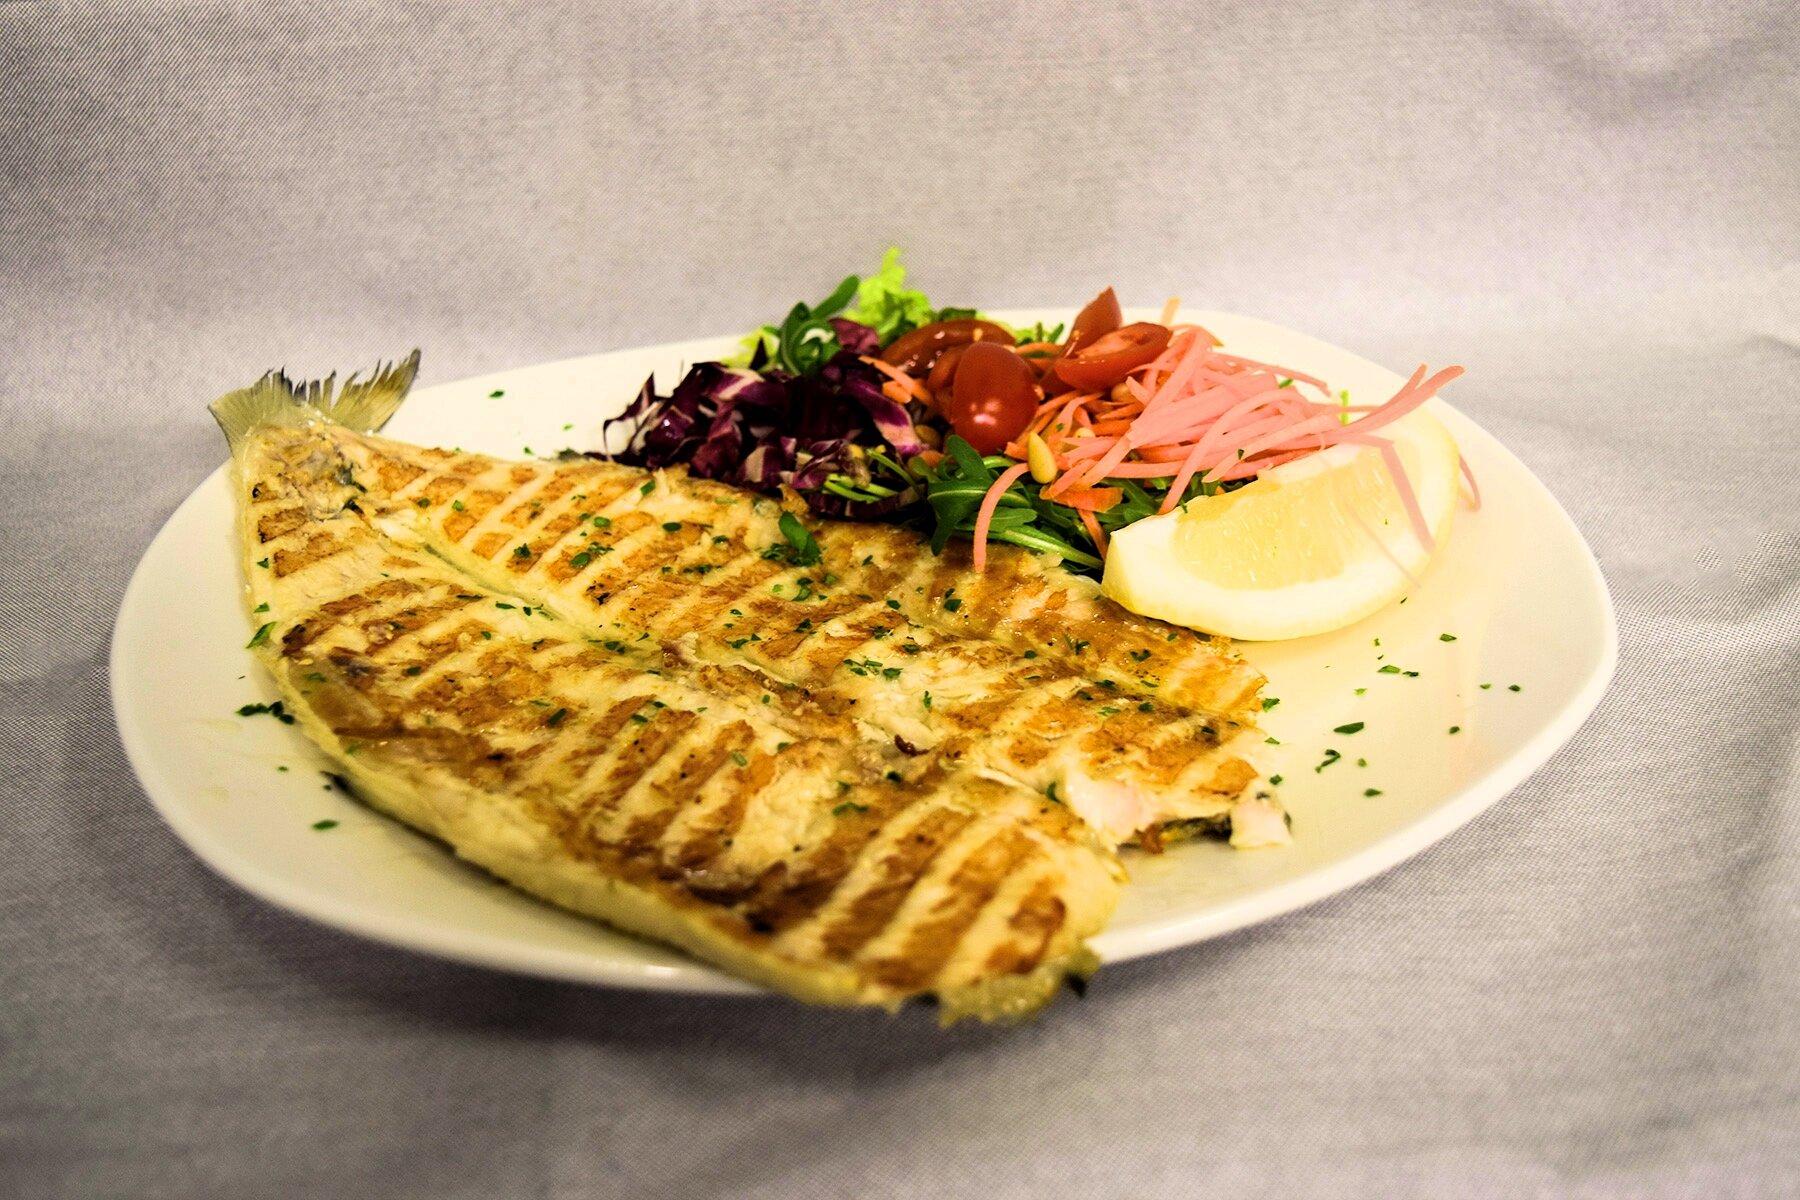 Image via  Farout restaurant